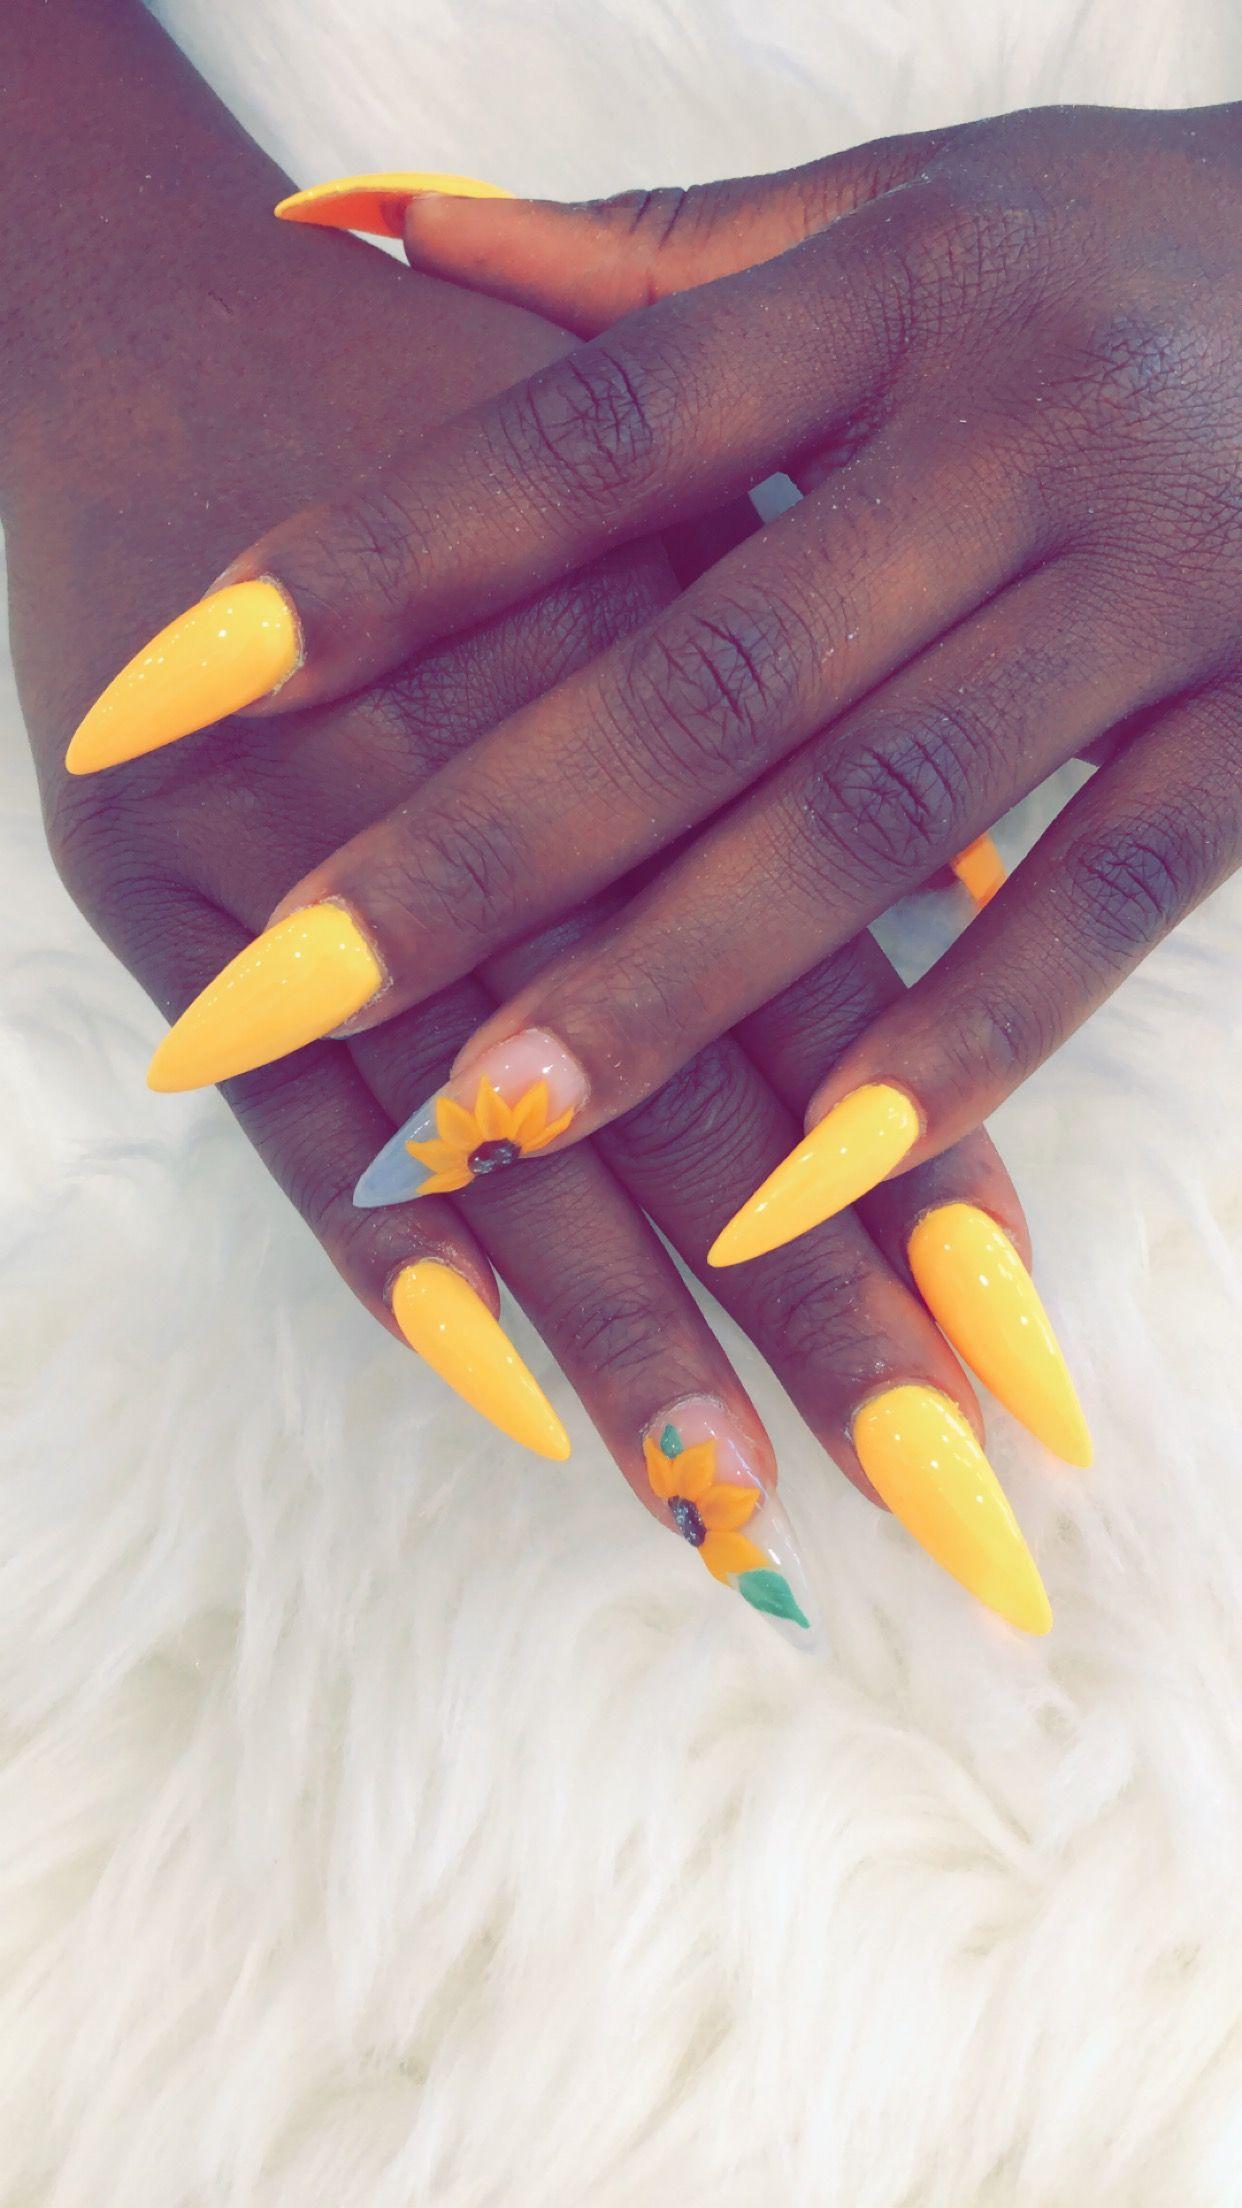 Sunflower | Solar nails, Acrylic flowers, Stiletto nails